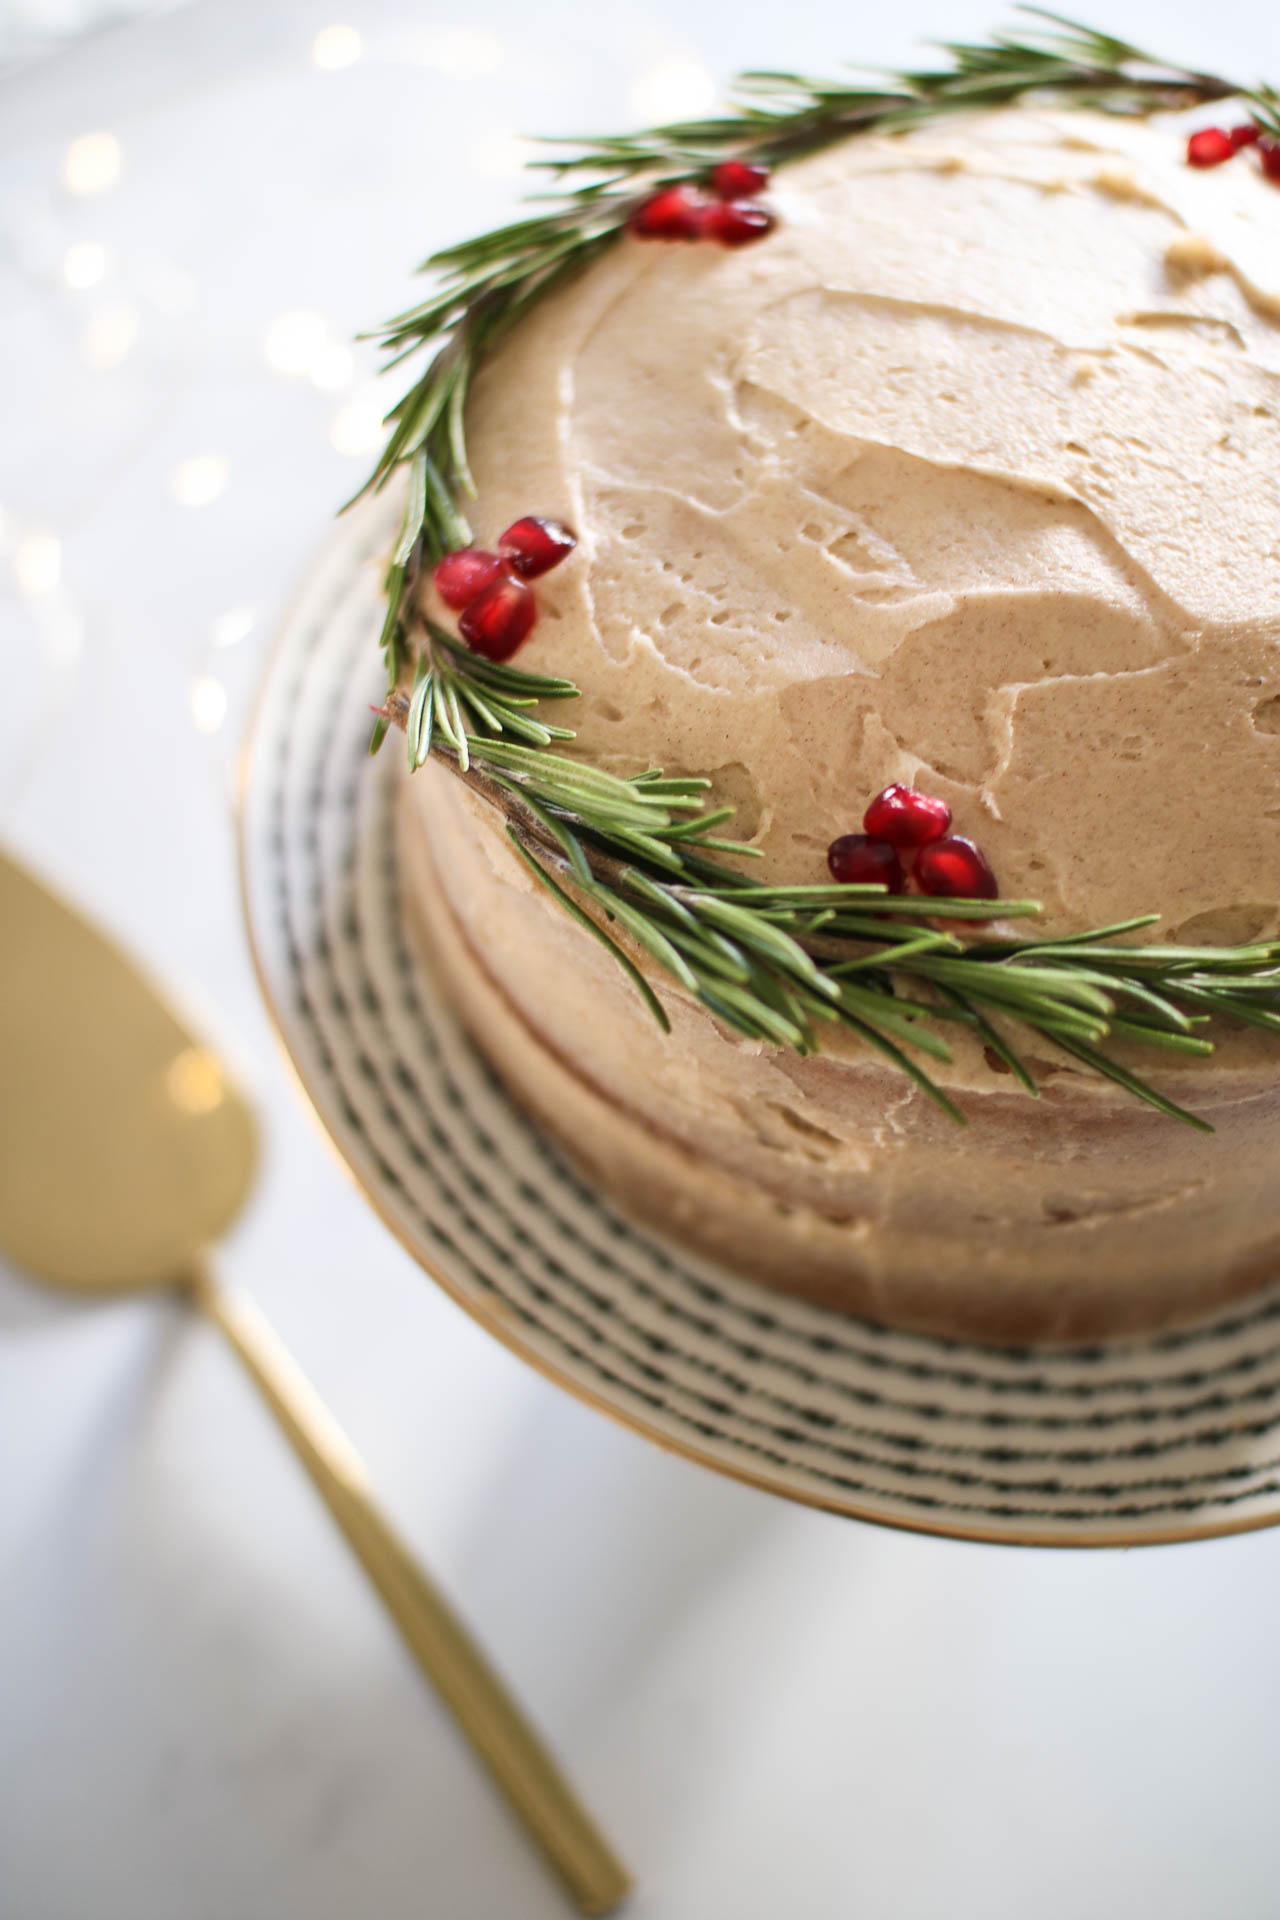 Christmas baking: Festive Spiced Cake recipe